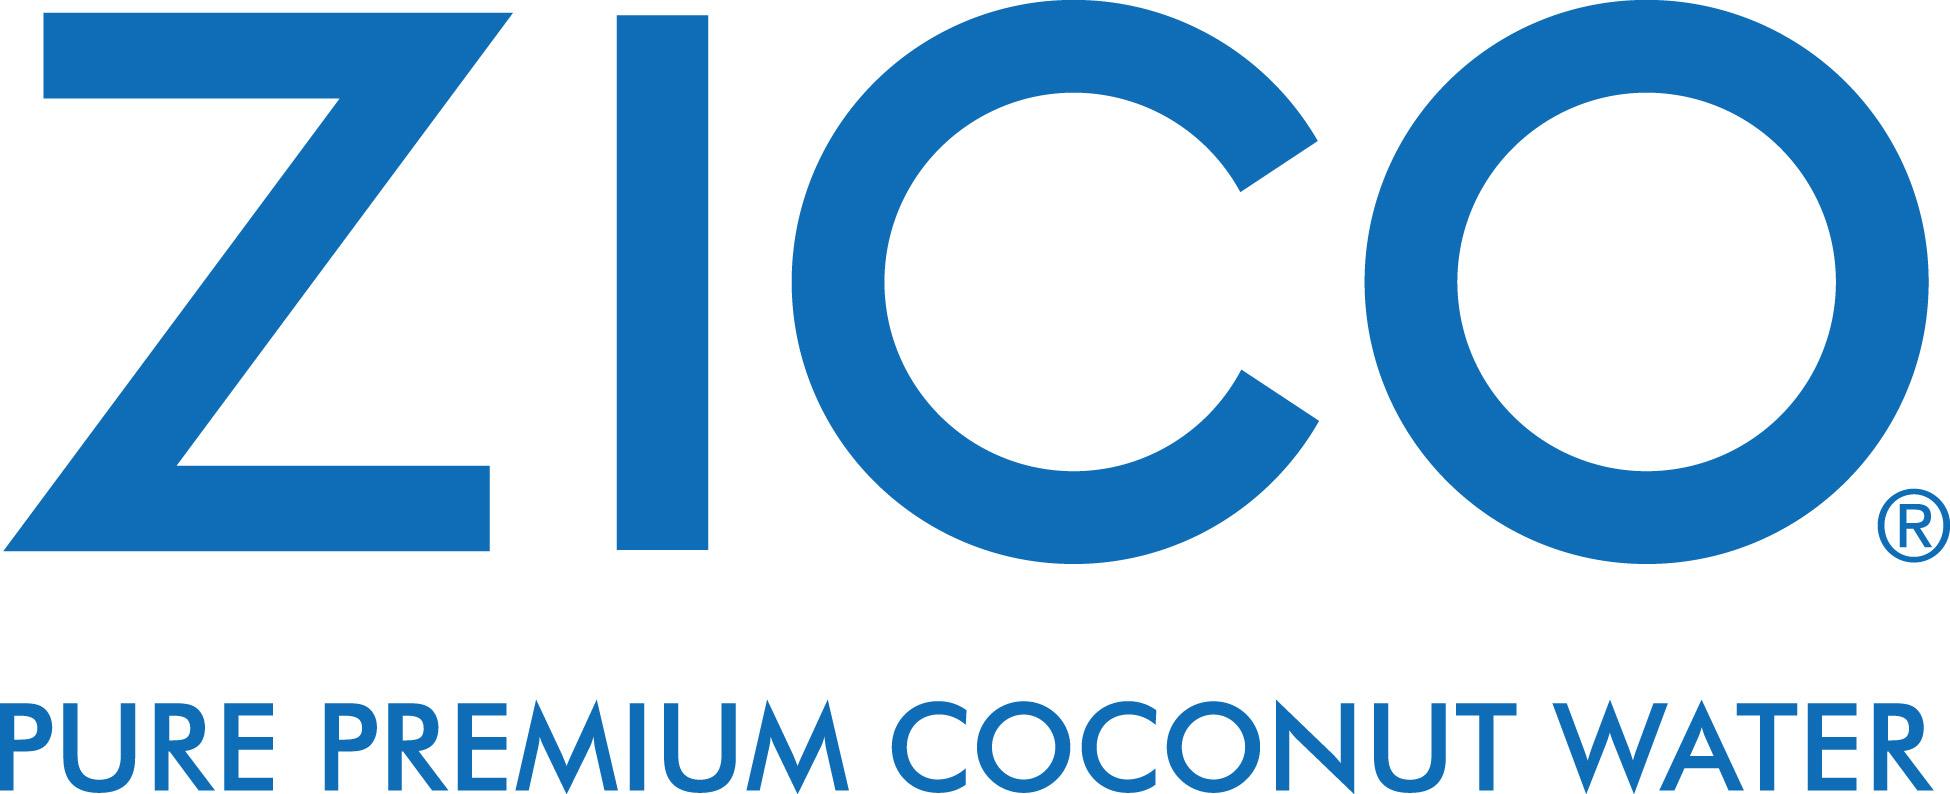 ZICO-Logo1.jpg